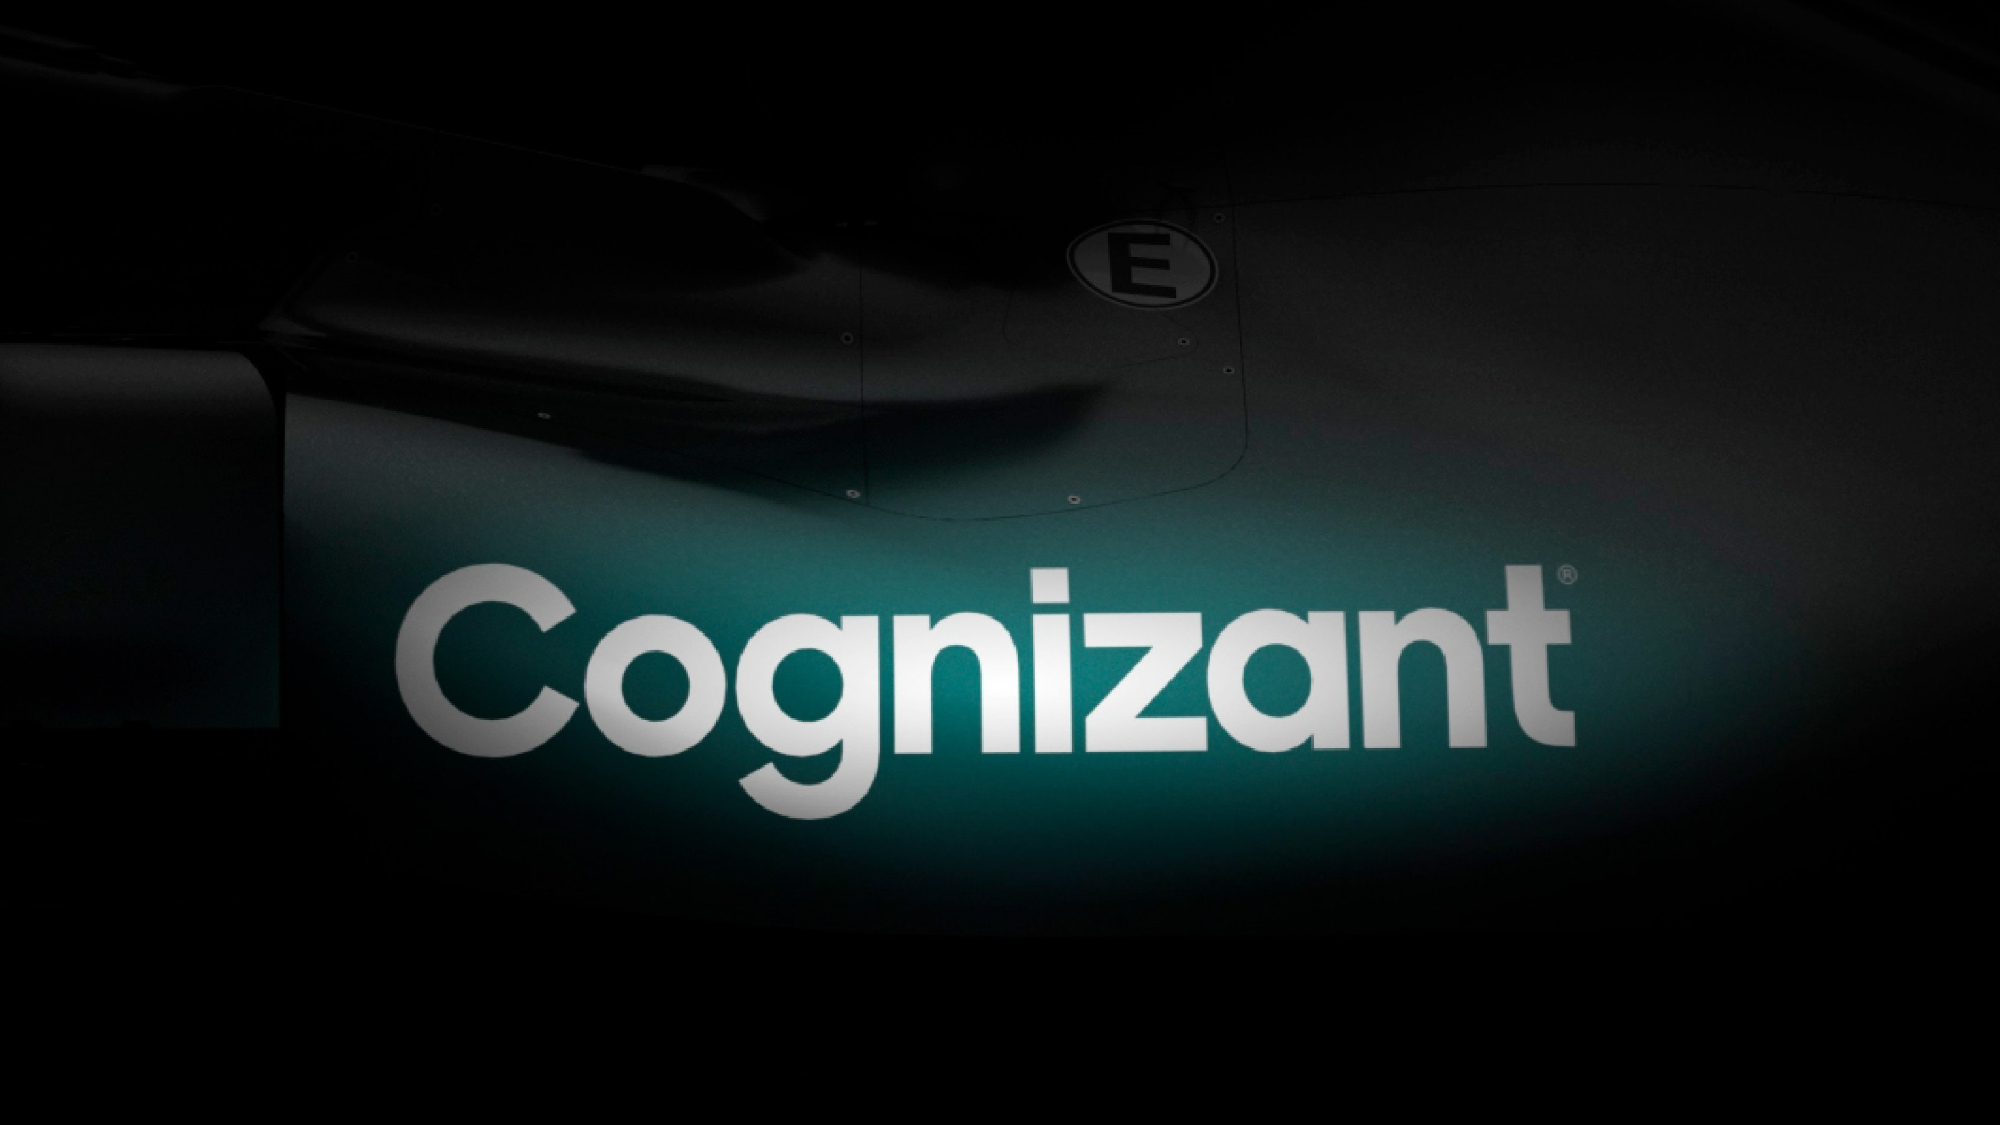 Aston Martin announces Cognizant as F1 title sponsor